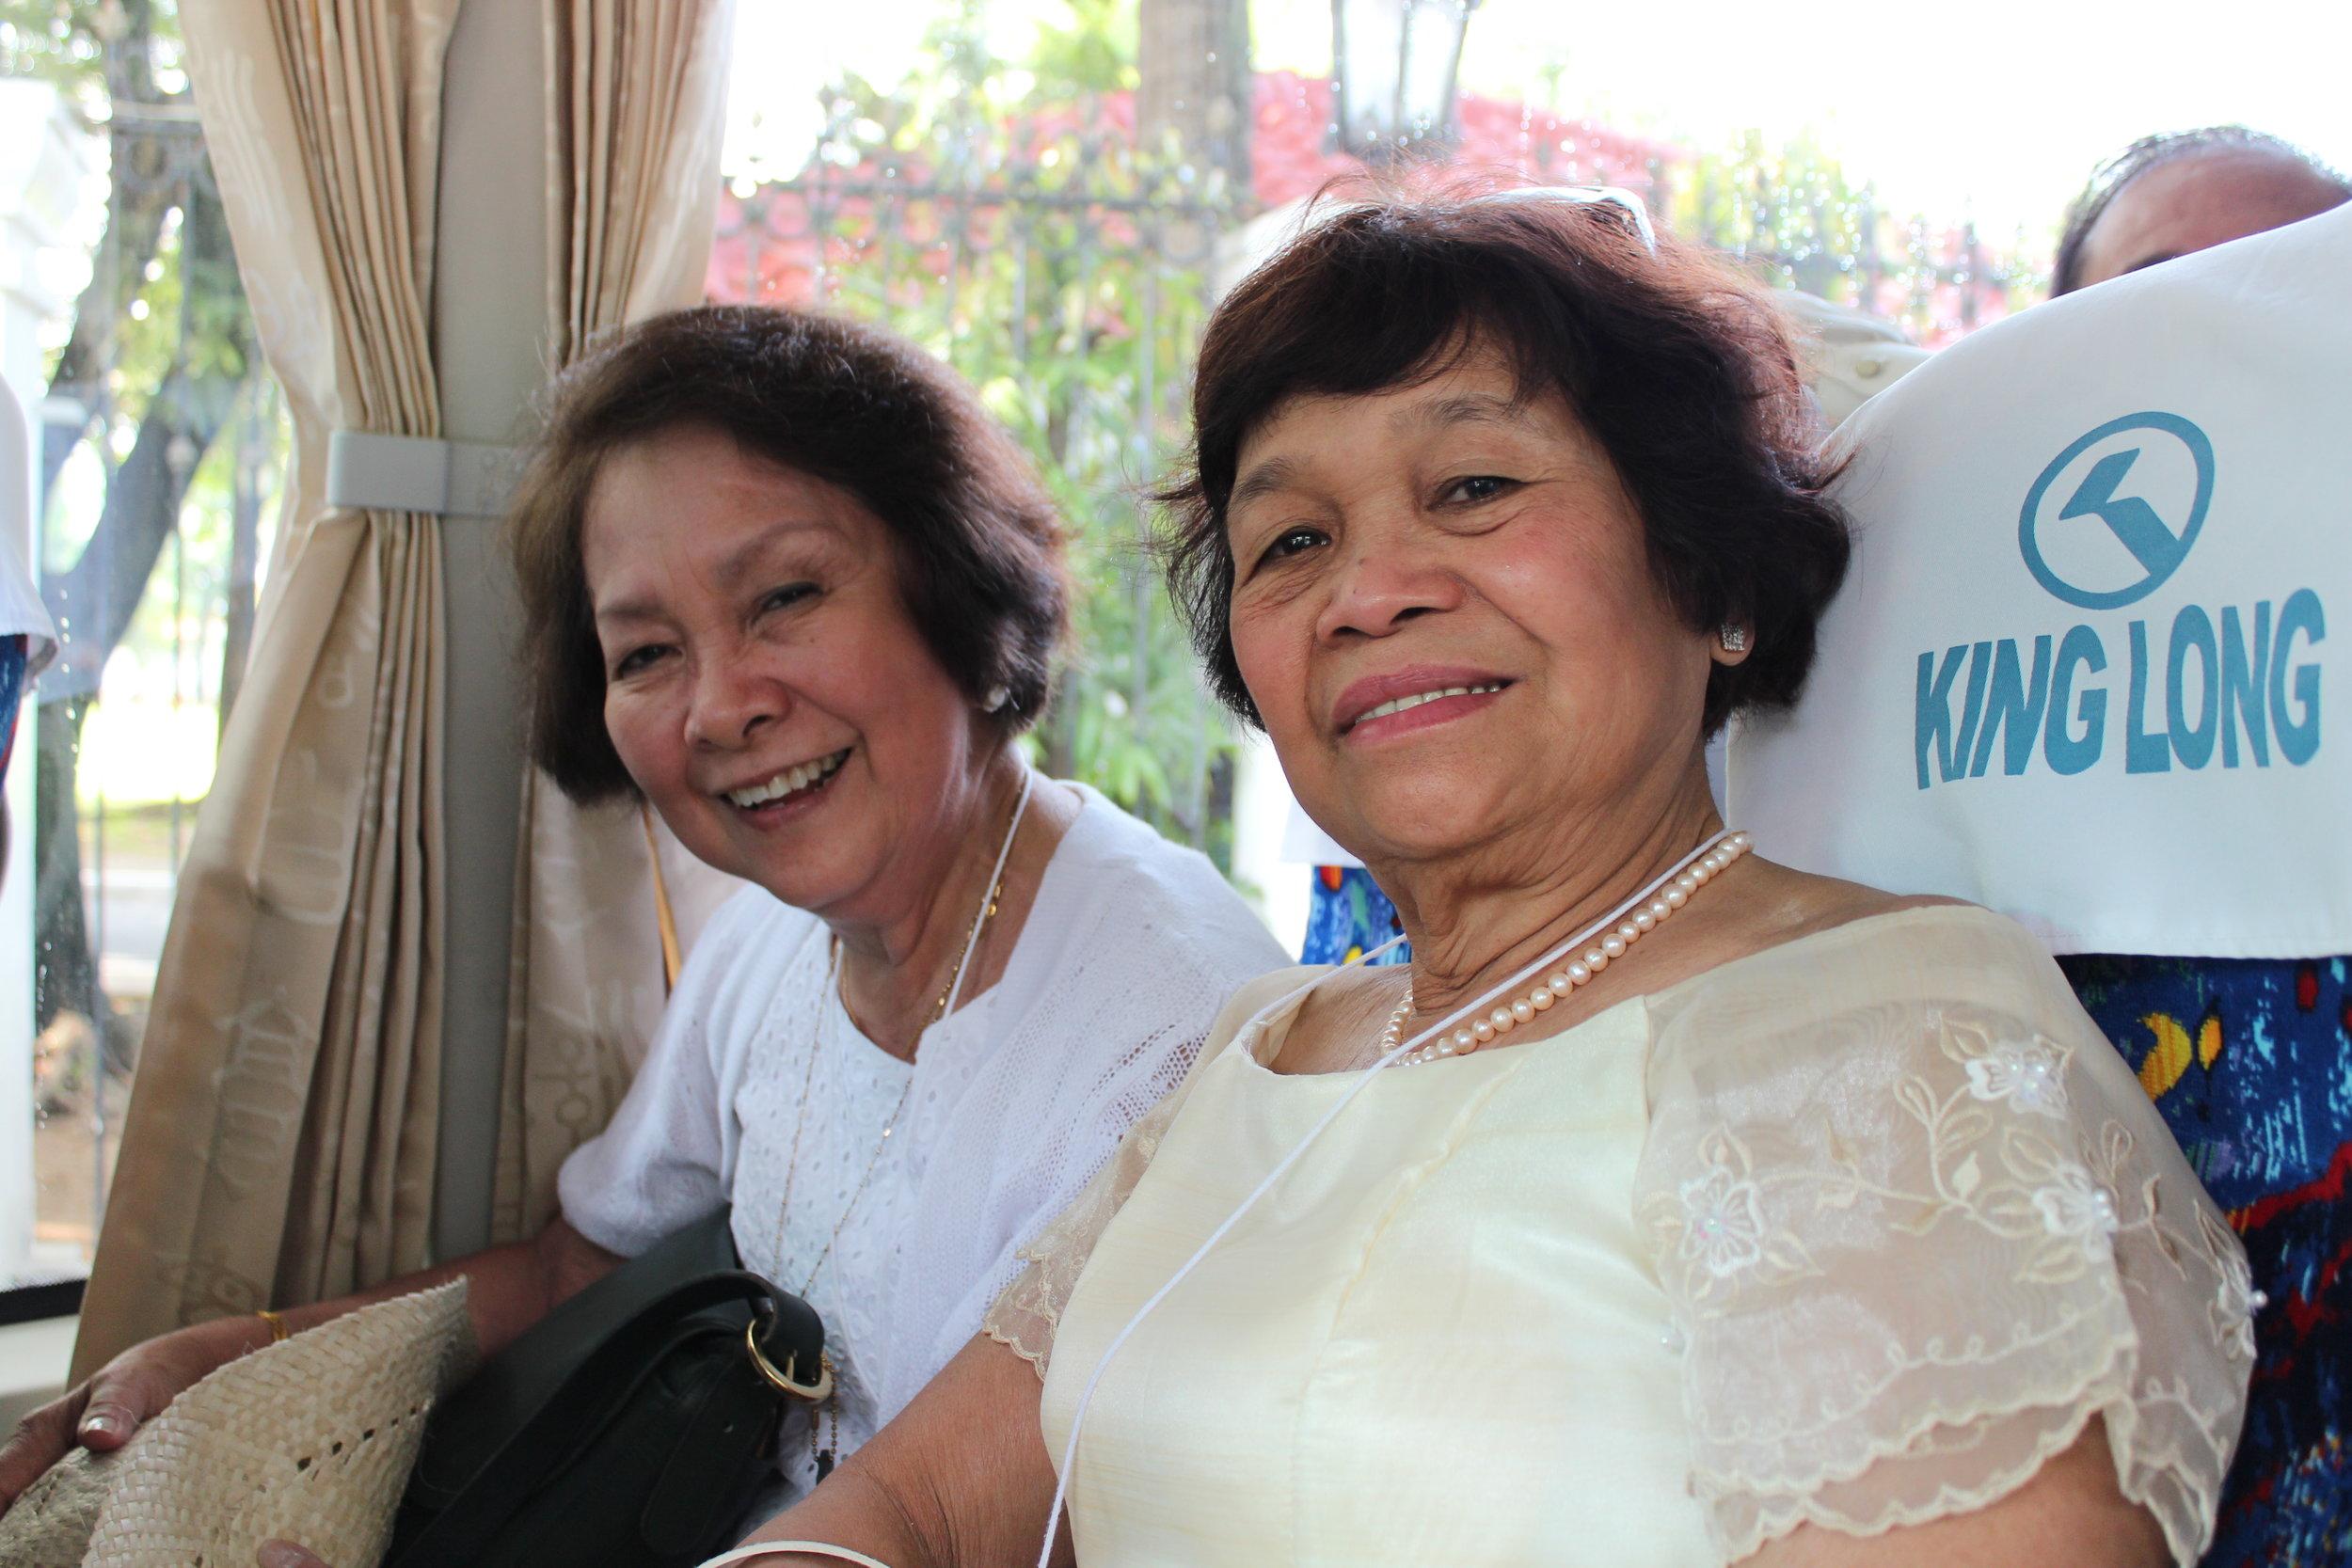 New friends, Philippines Ambassadors' tour 2013